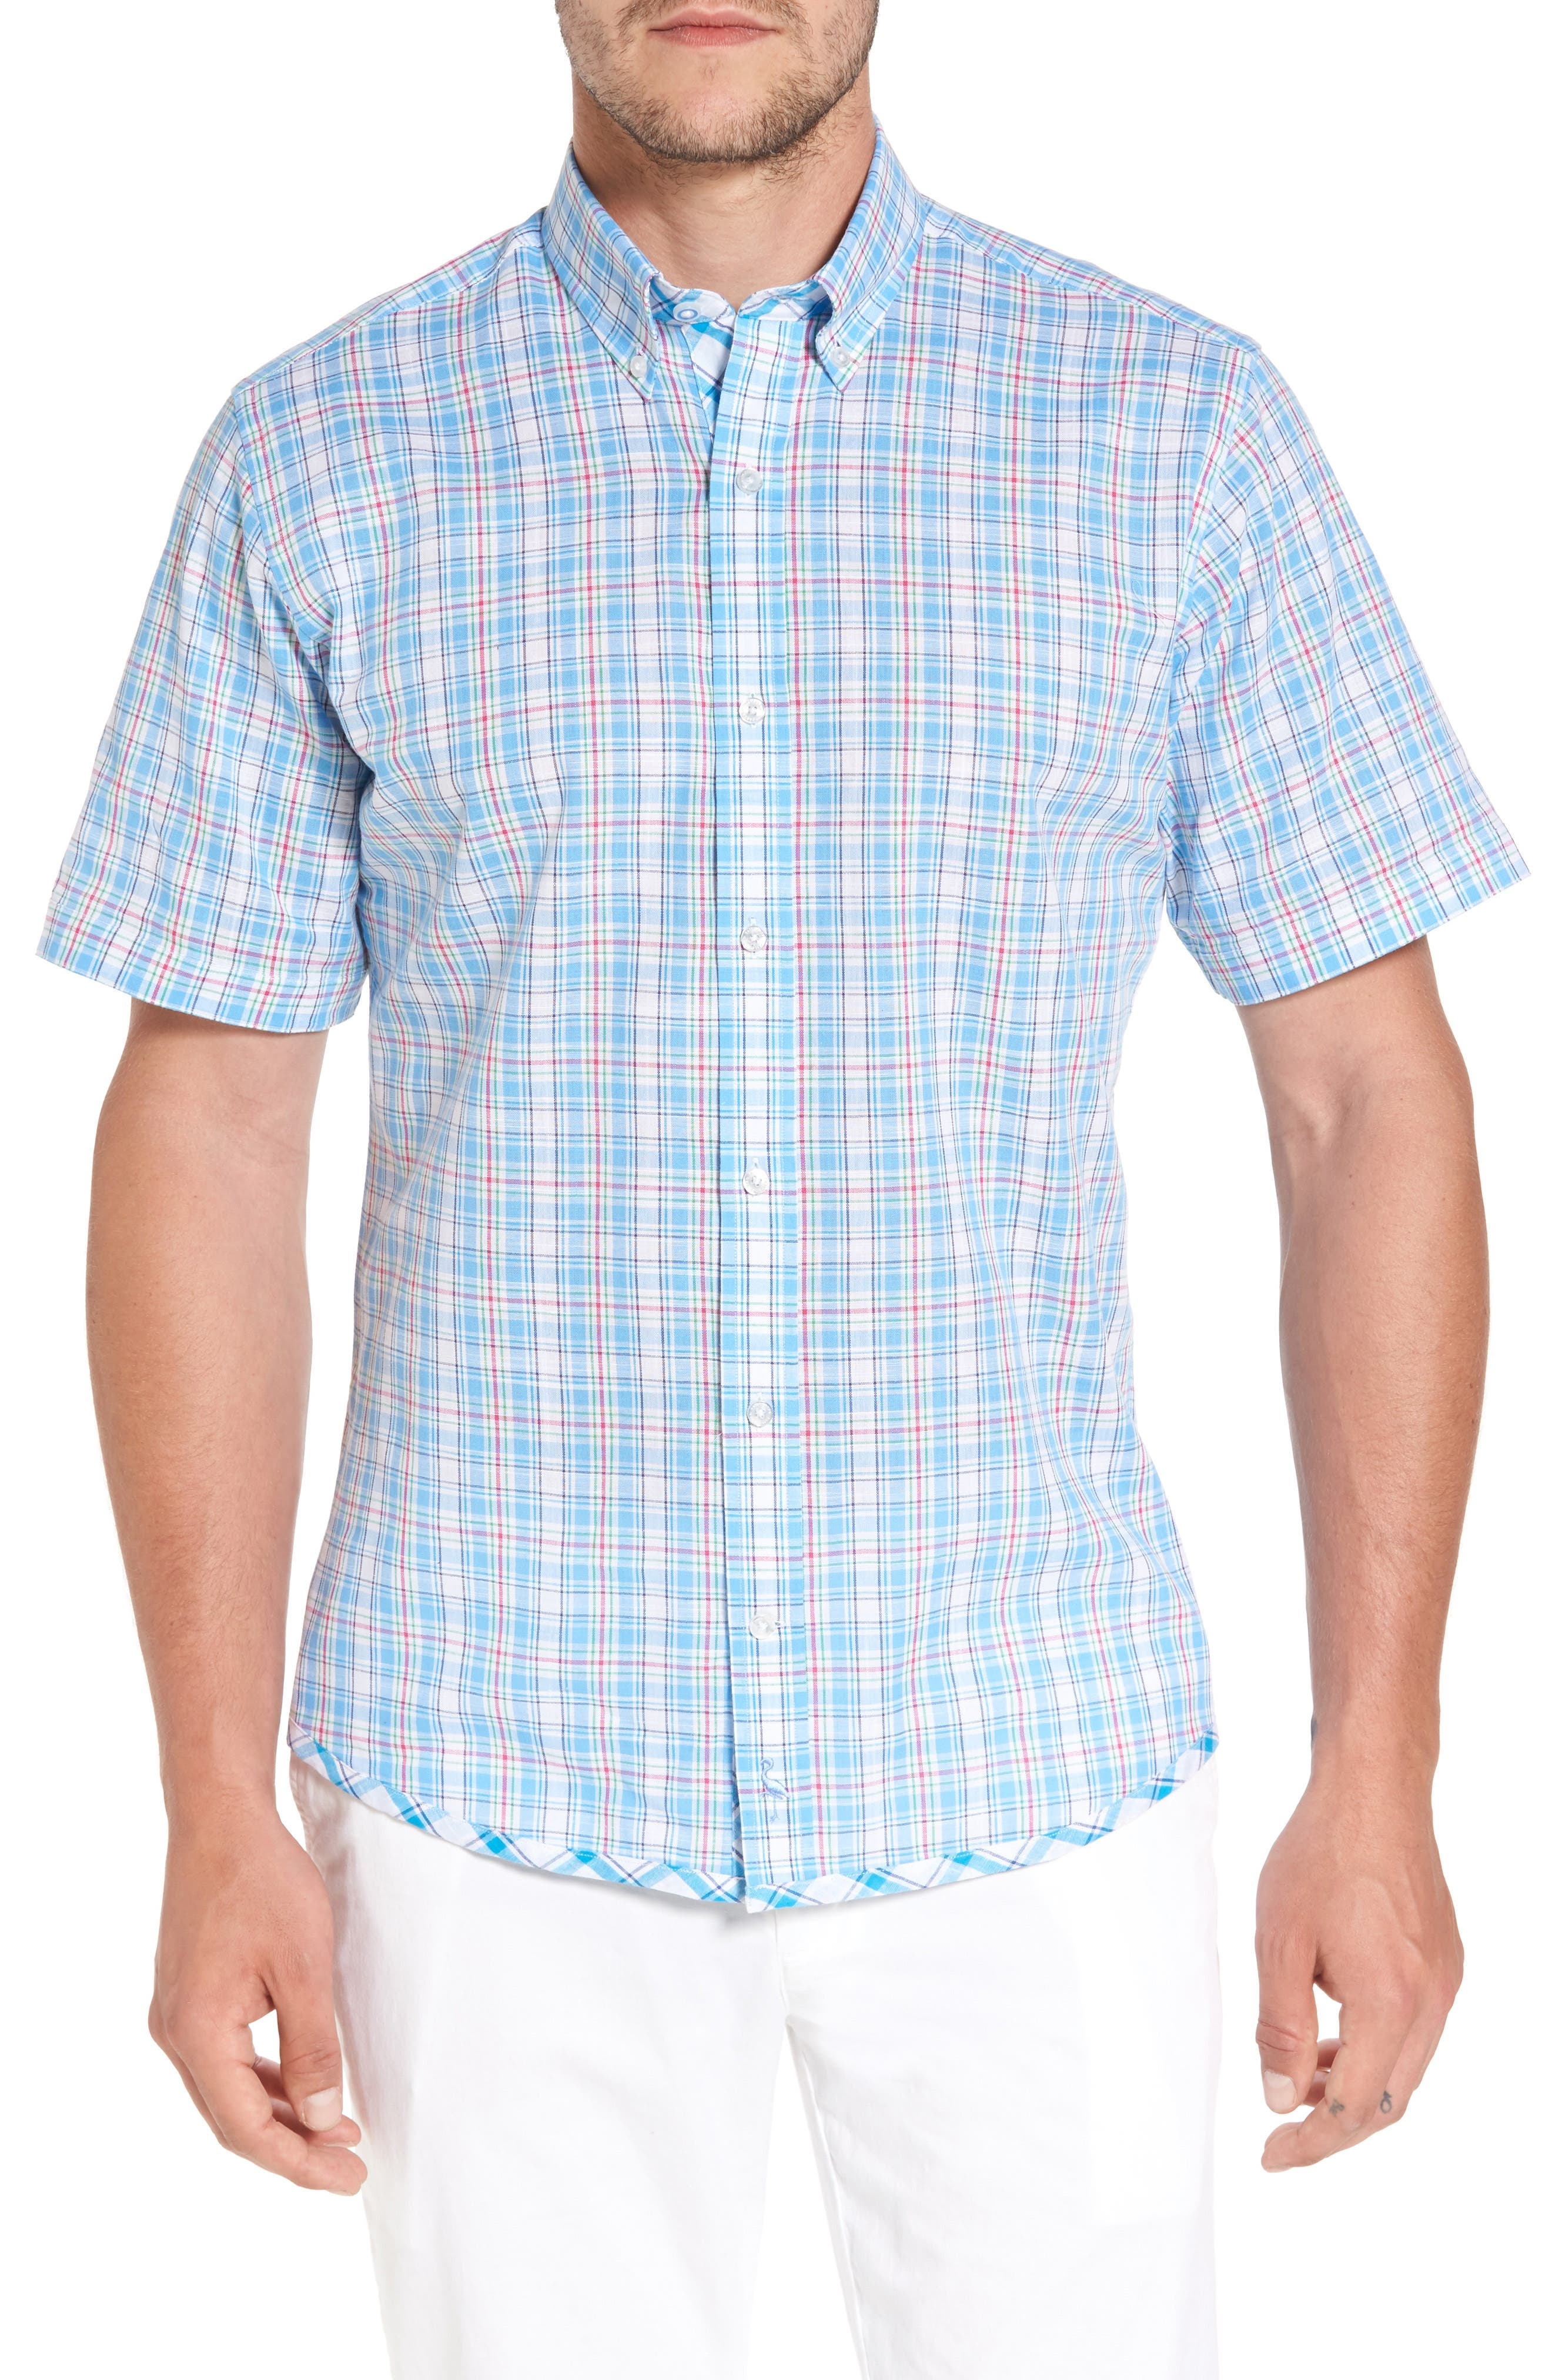 Nectarine Sport Shirt,                         Main,                         color,